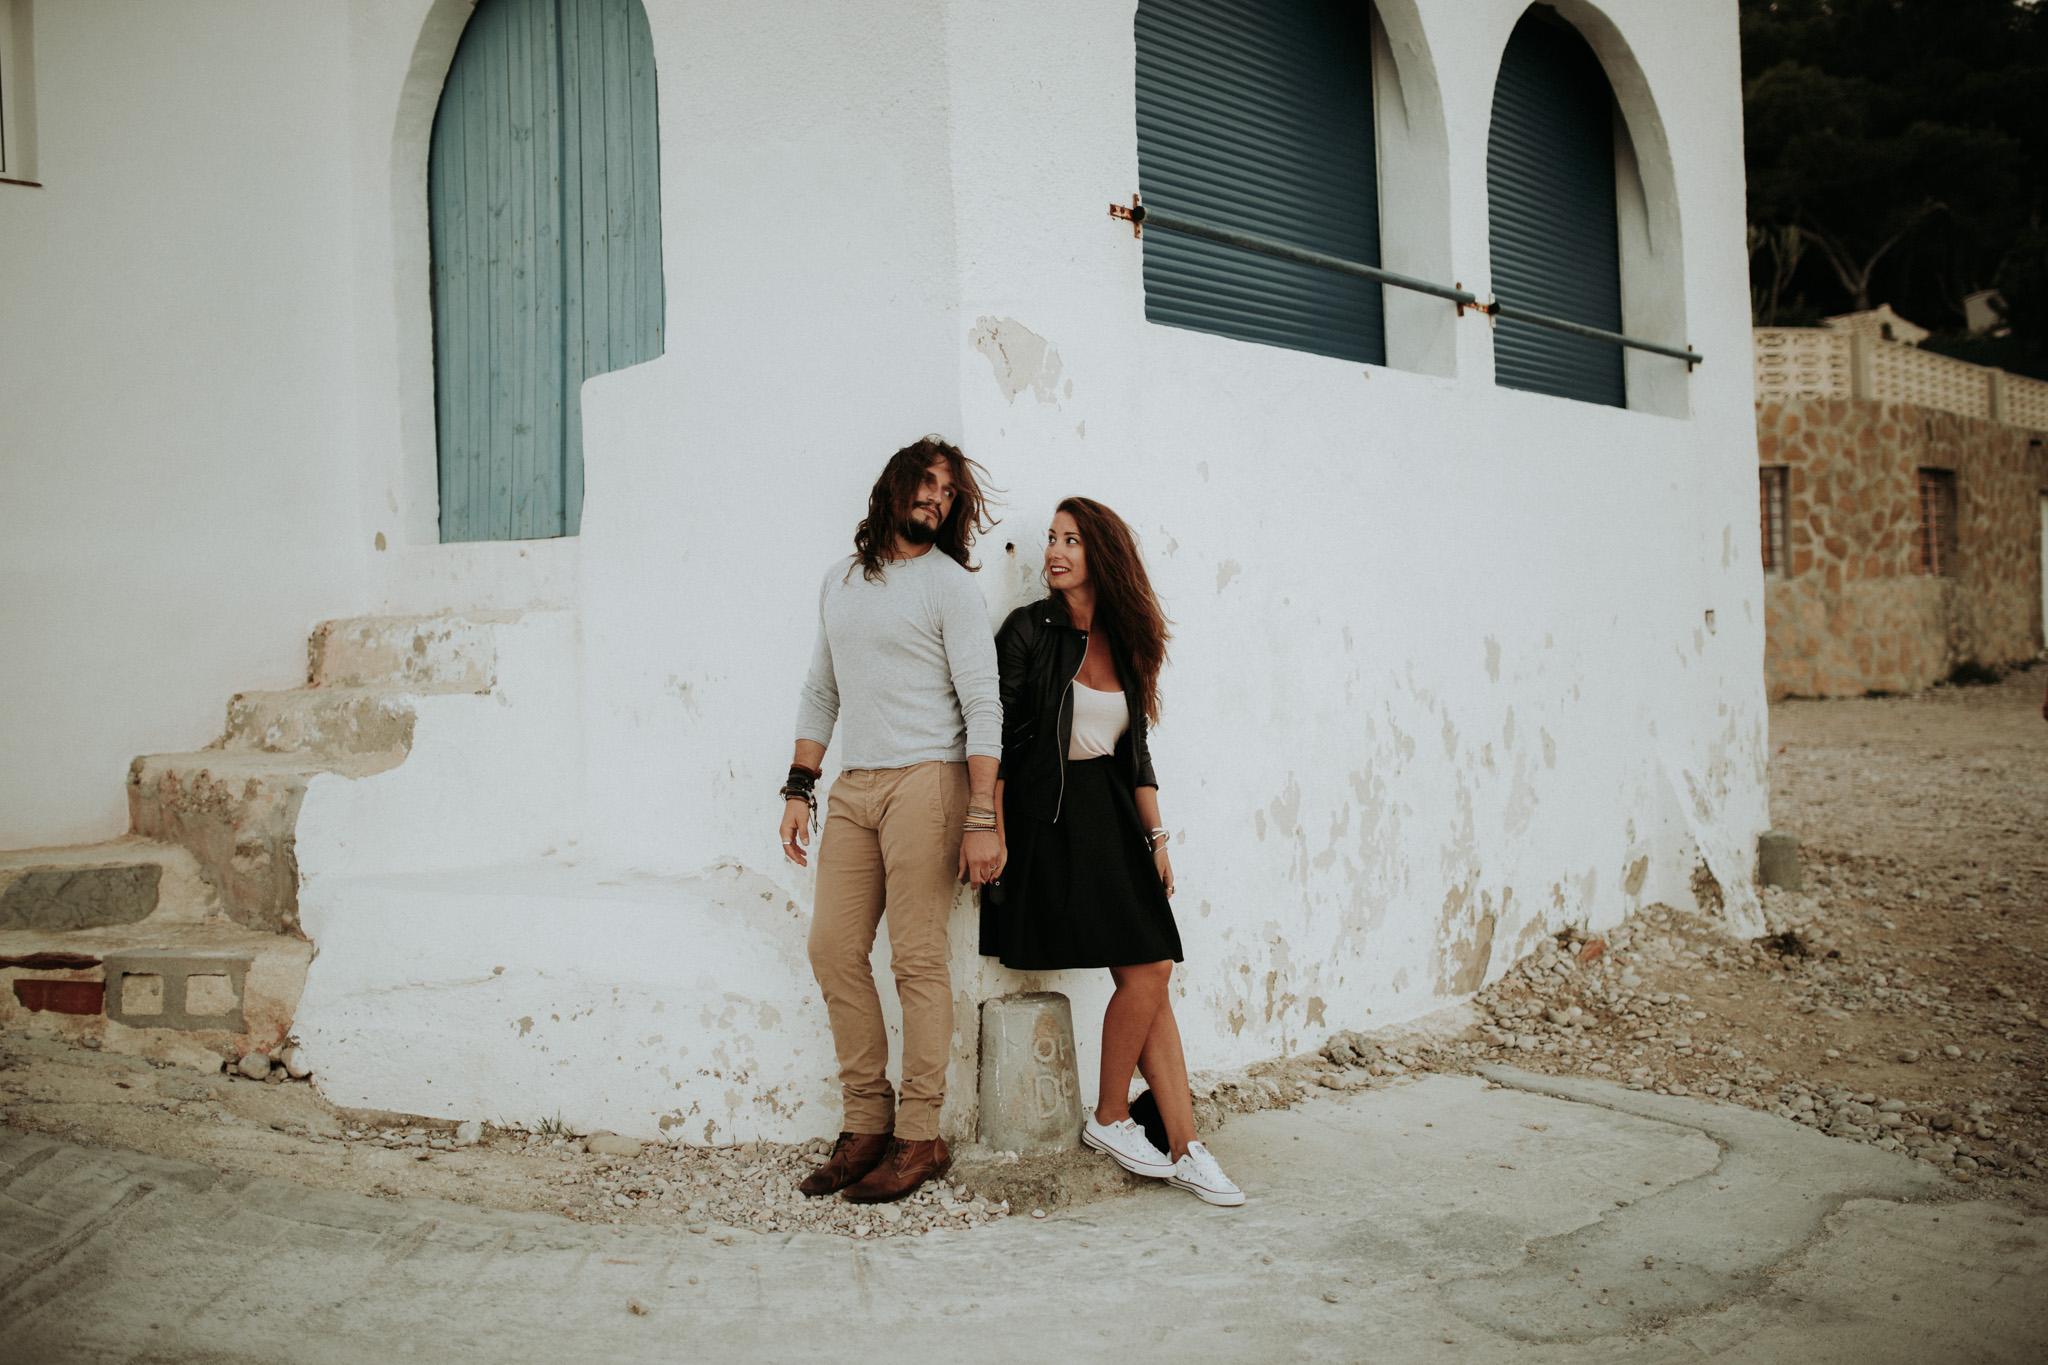 Olga+y+Carmelo+baja-97.jpg